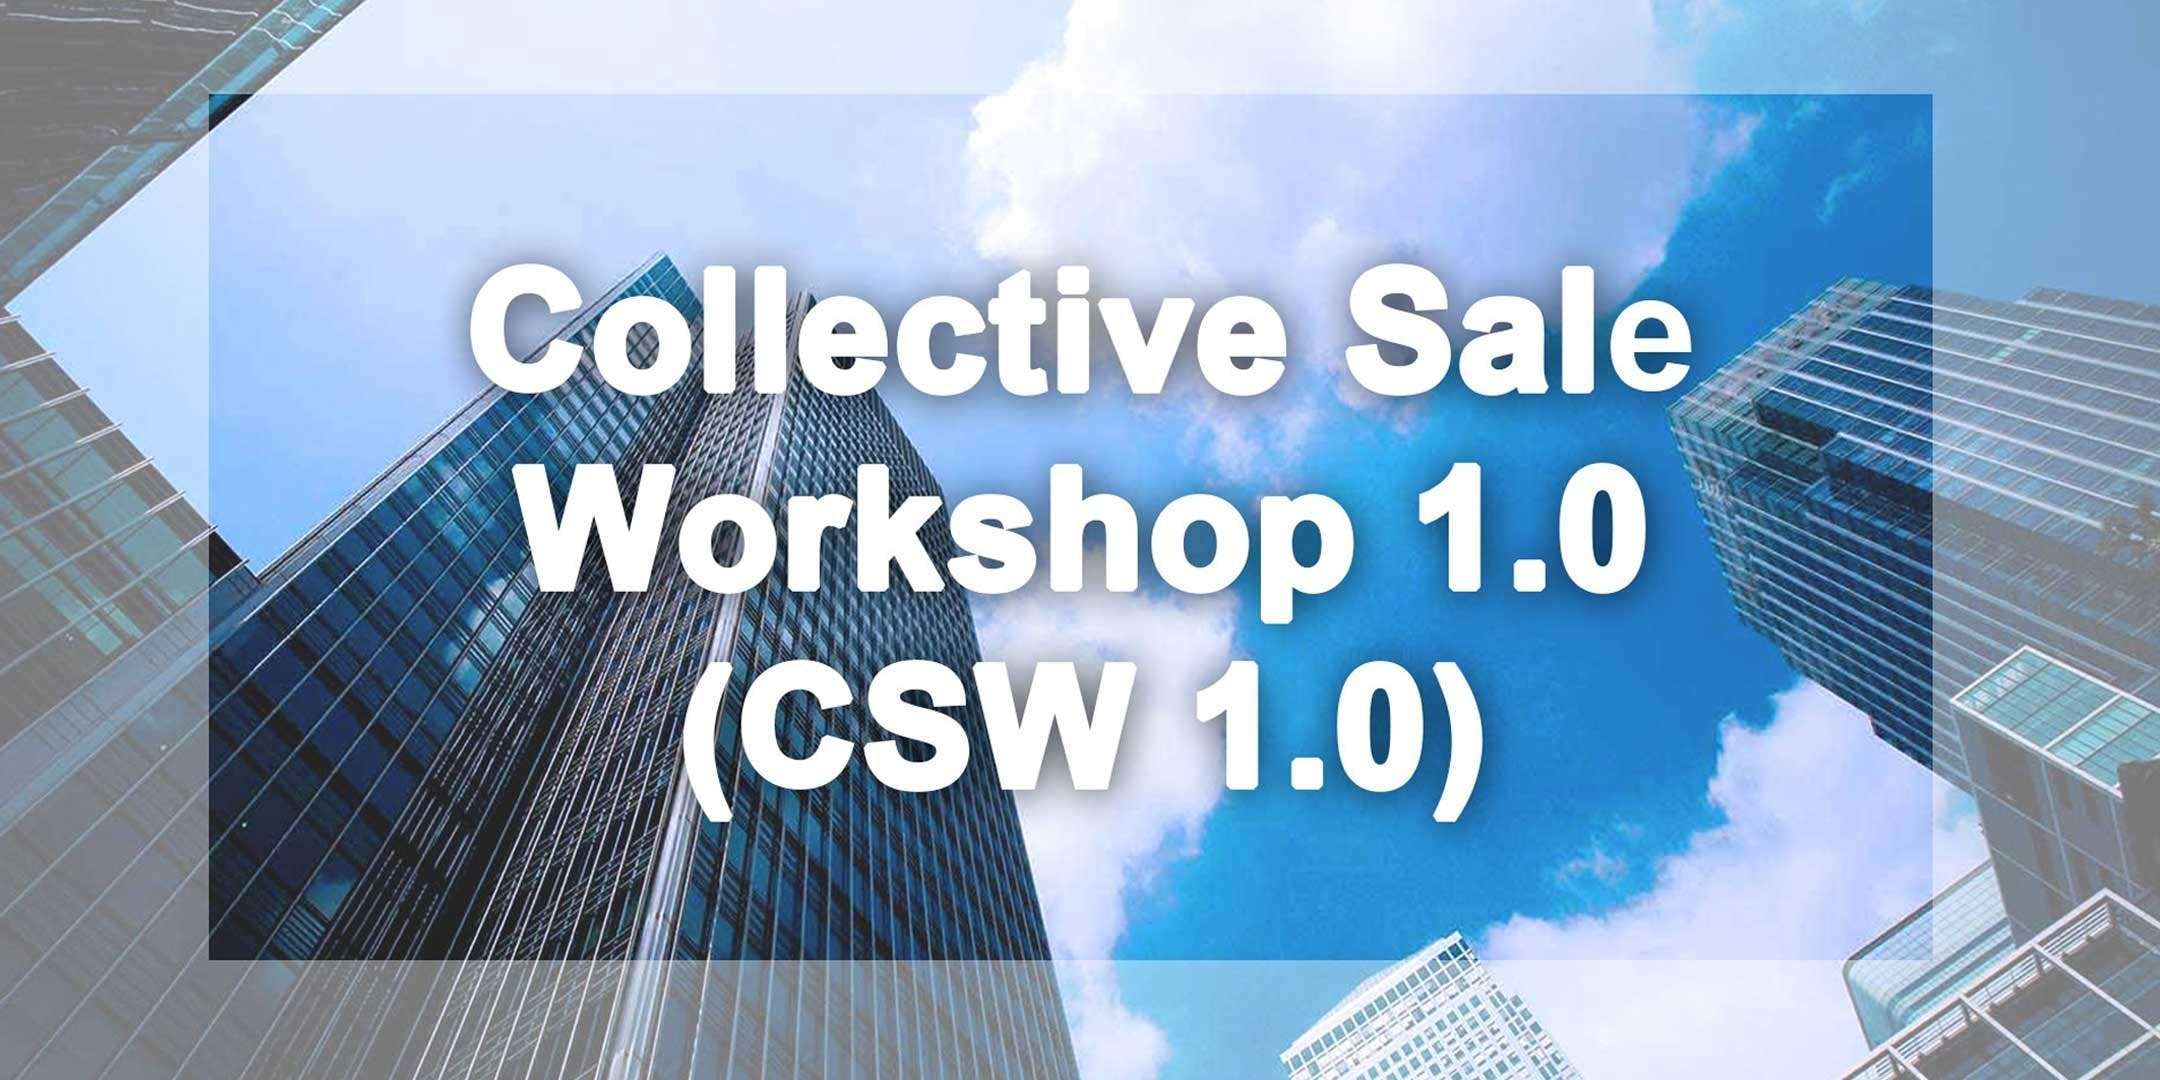 Collective Sale Workshop 1.0 (CSW 1.0)